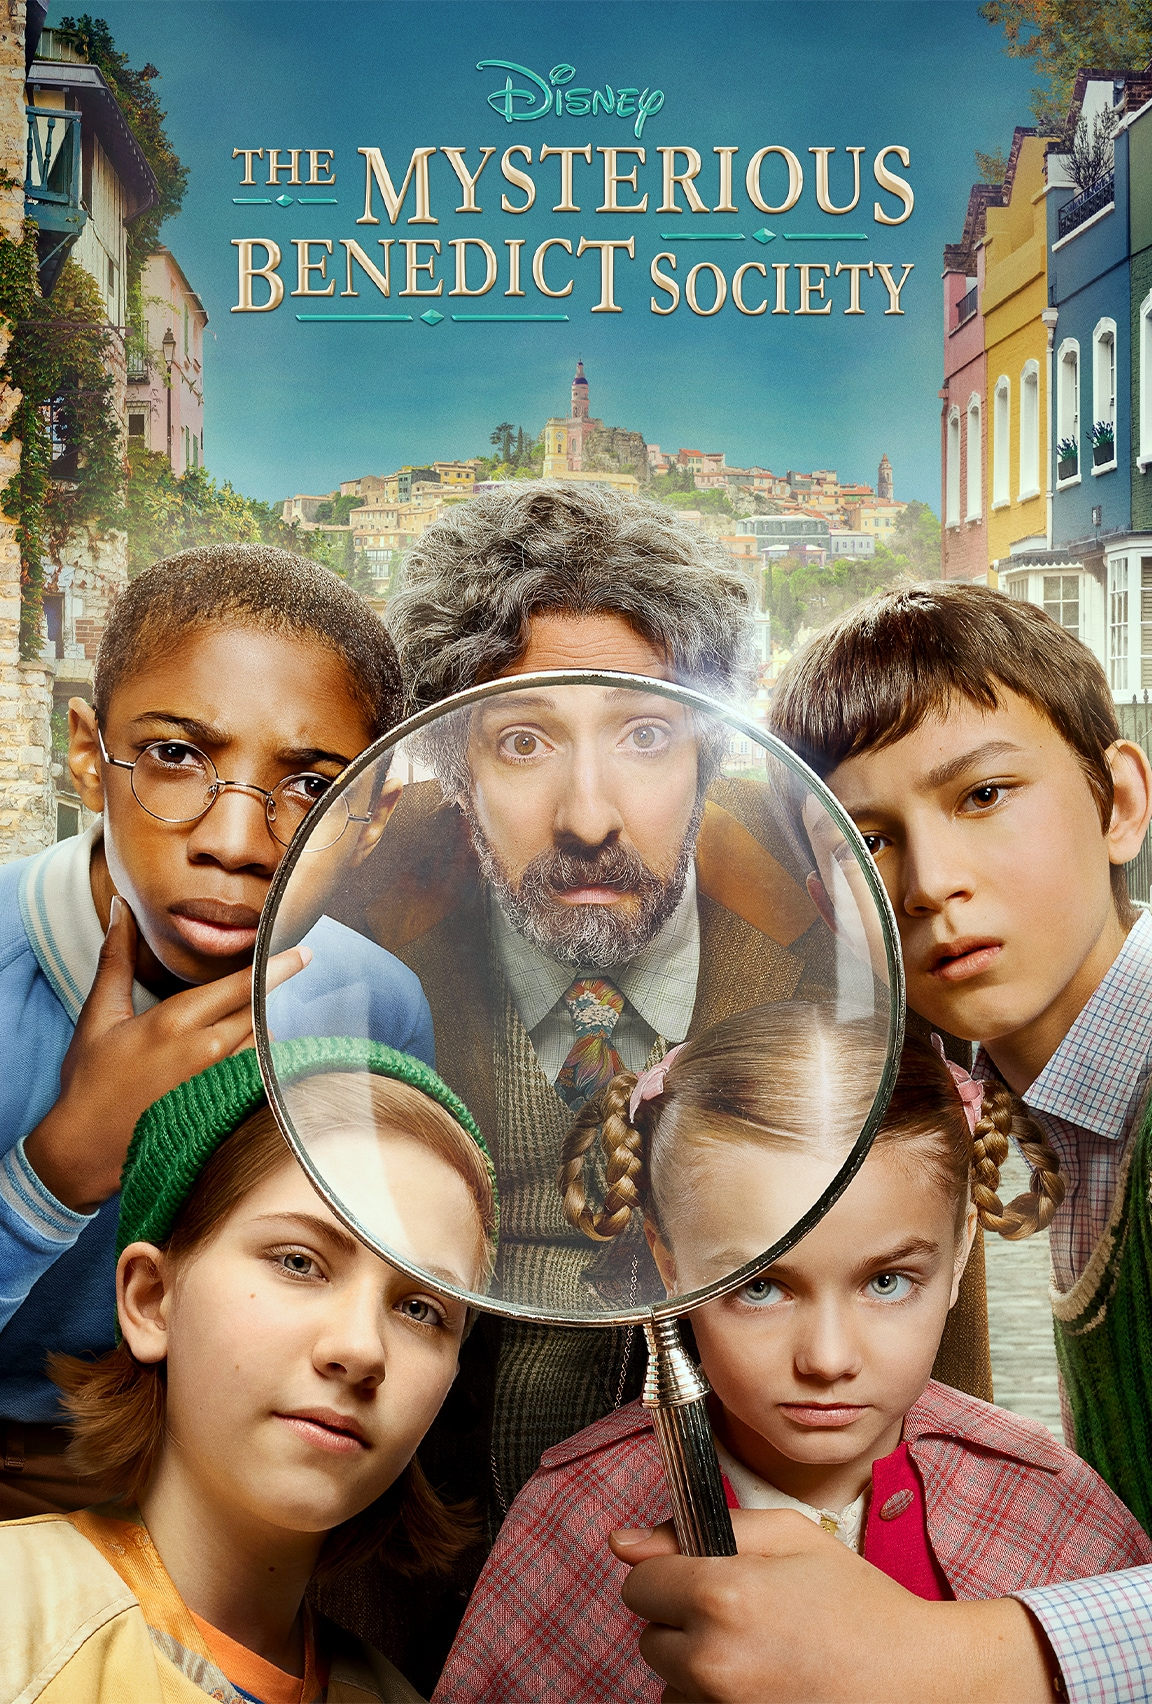 The Mysterious Benedict Society on Disney Plus